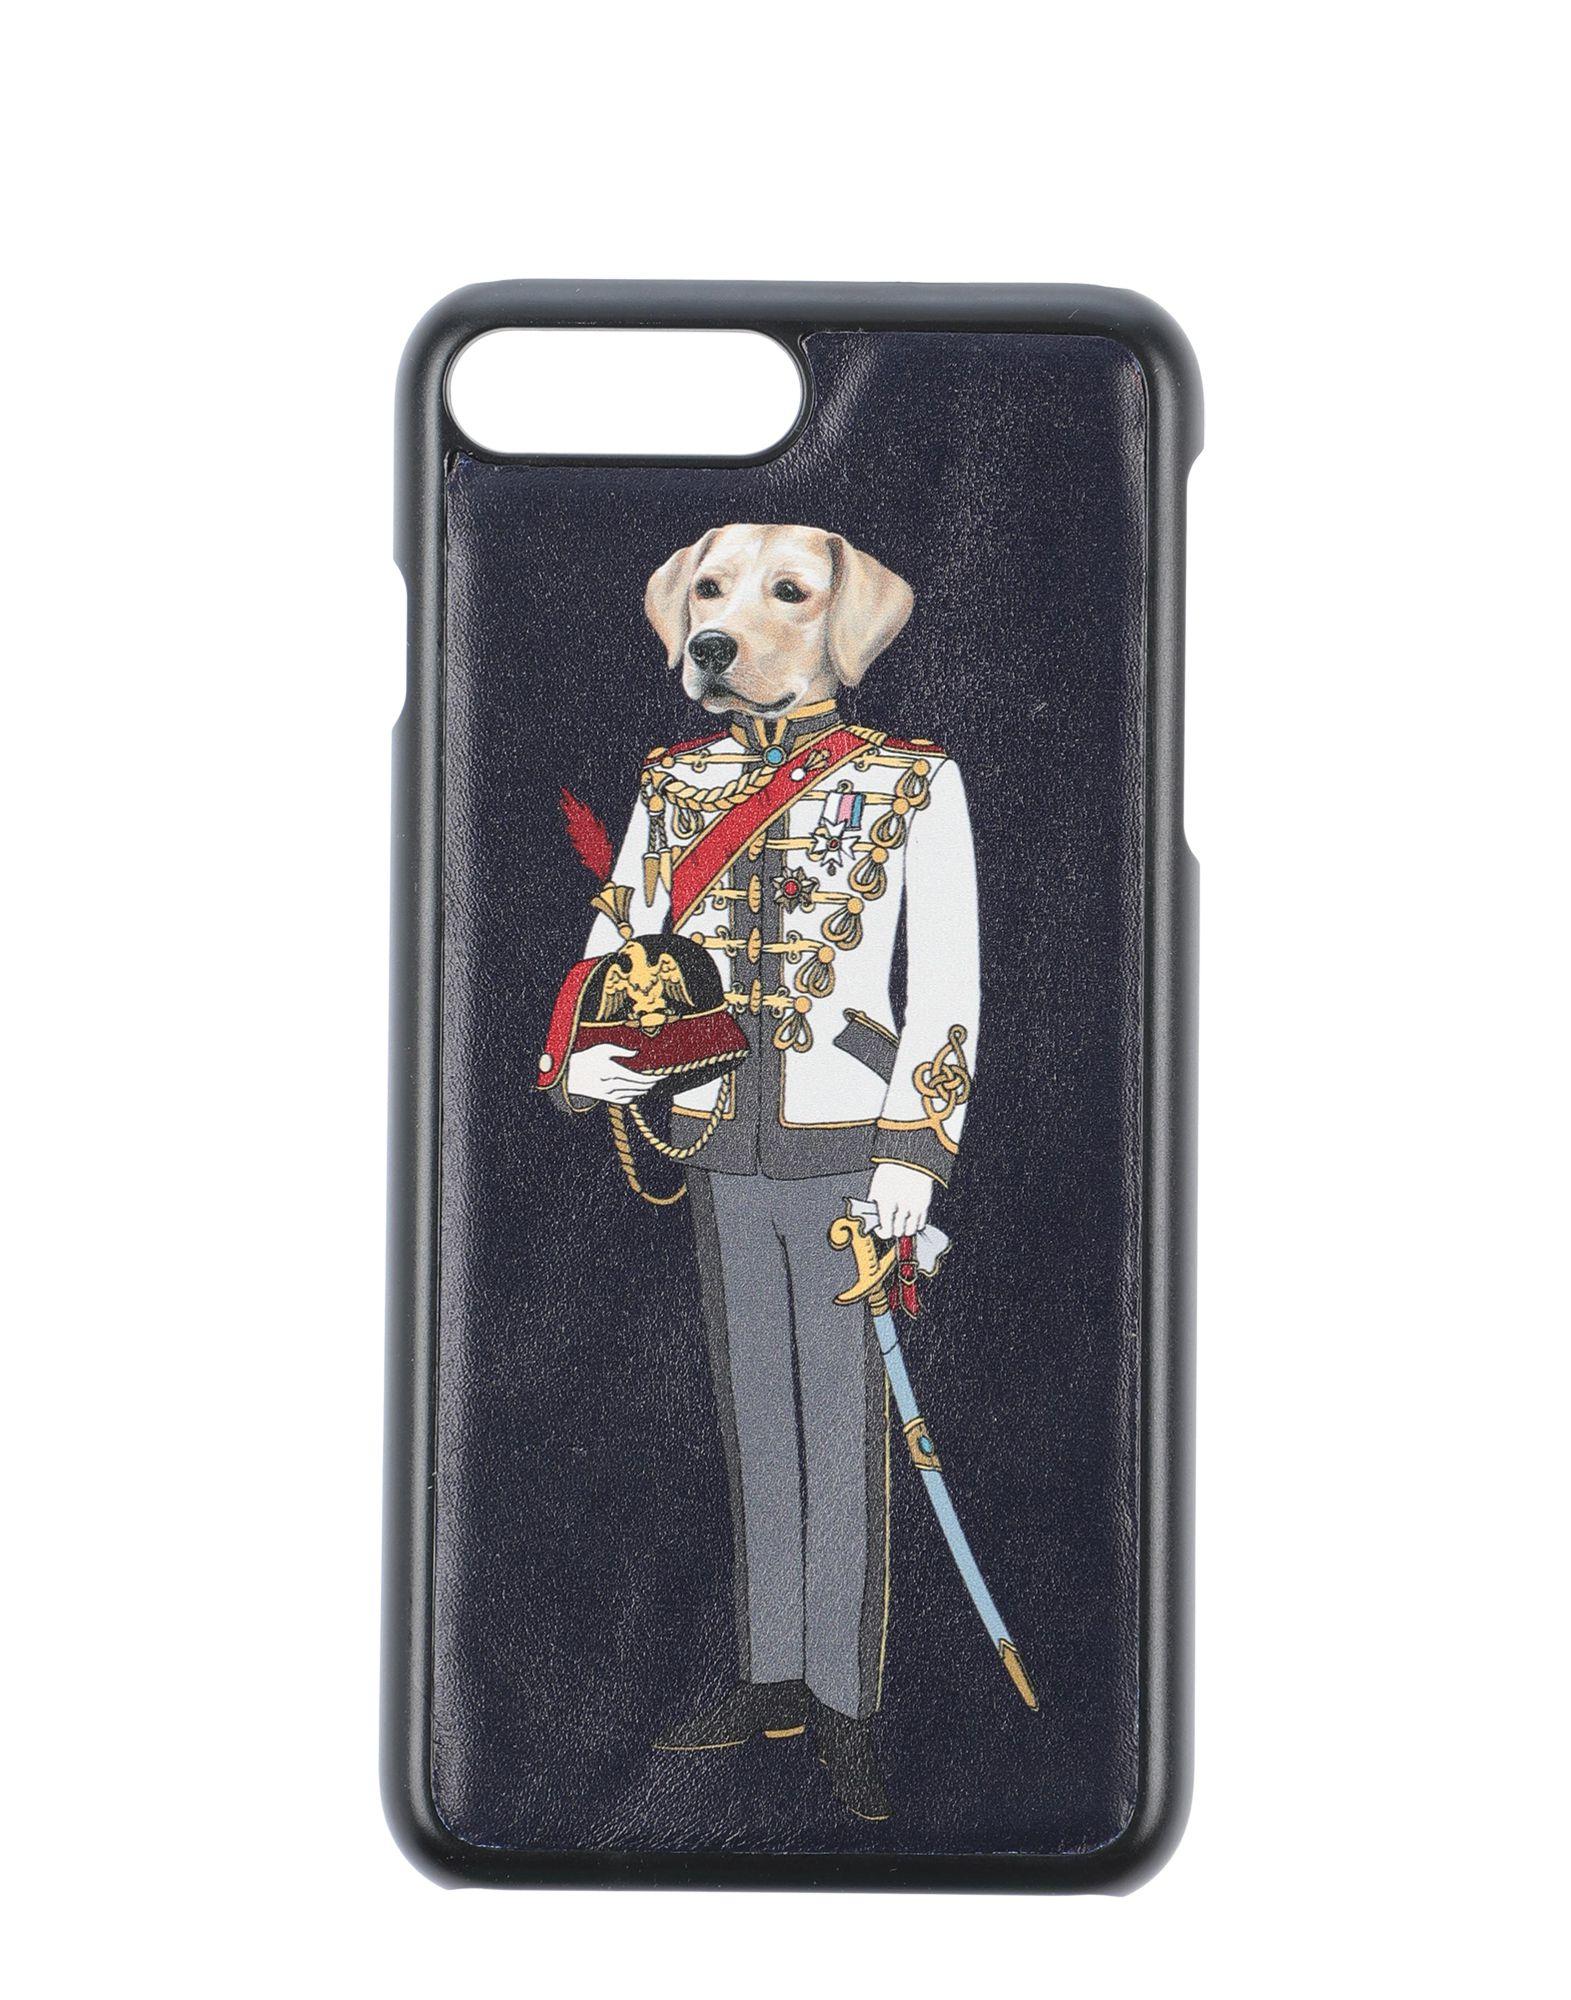 Фото - DOLCE & GABBANA Чехол printio чехол для iphone 7 plus объёмная печать обезьяна император